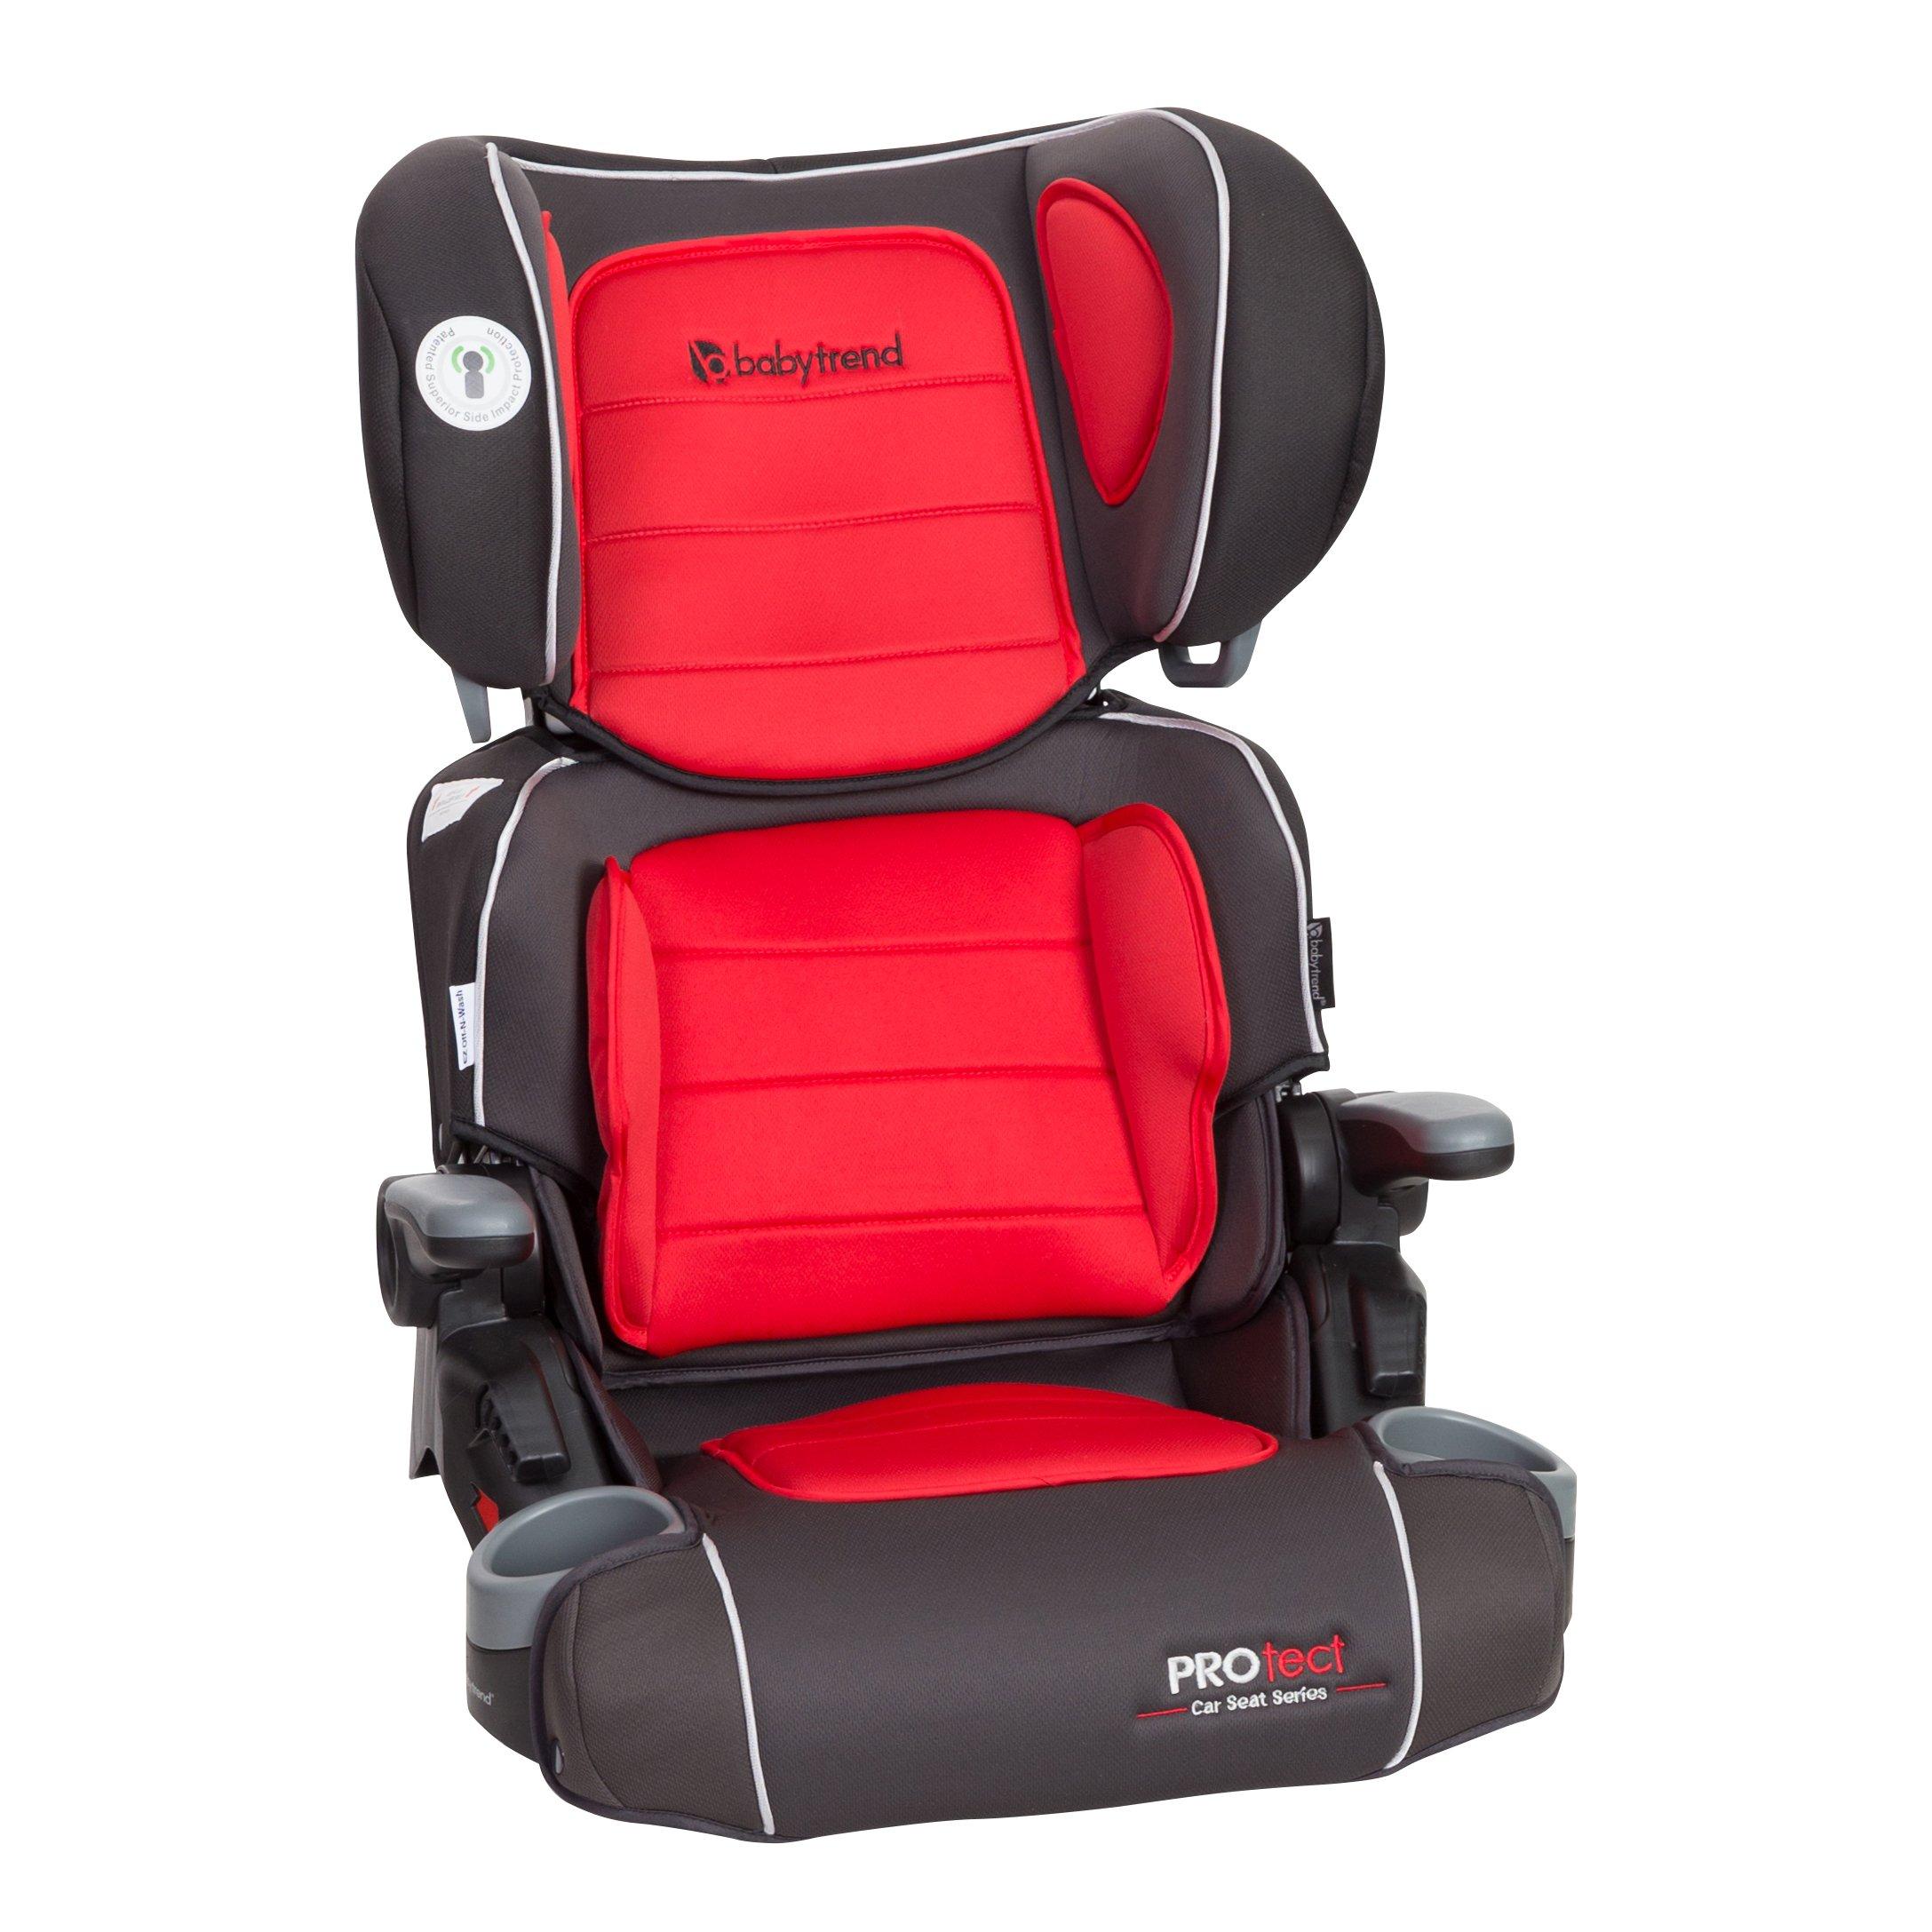 Amazon.com : Baby Trend Yumi Folding Booster Car Seat, Moto : Baby